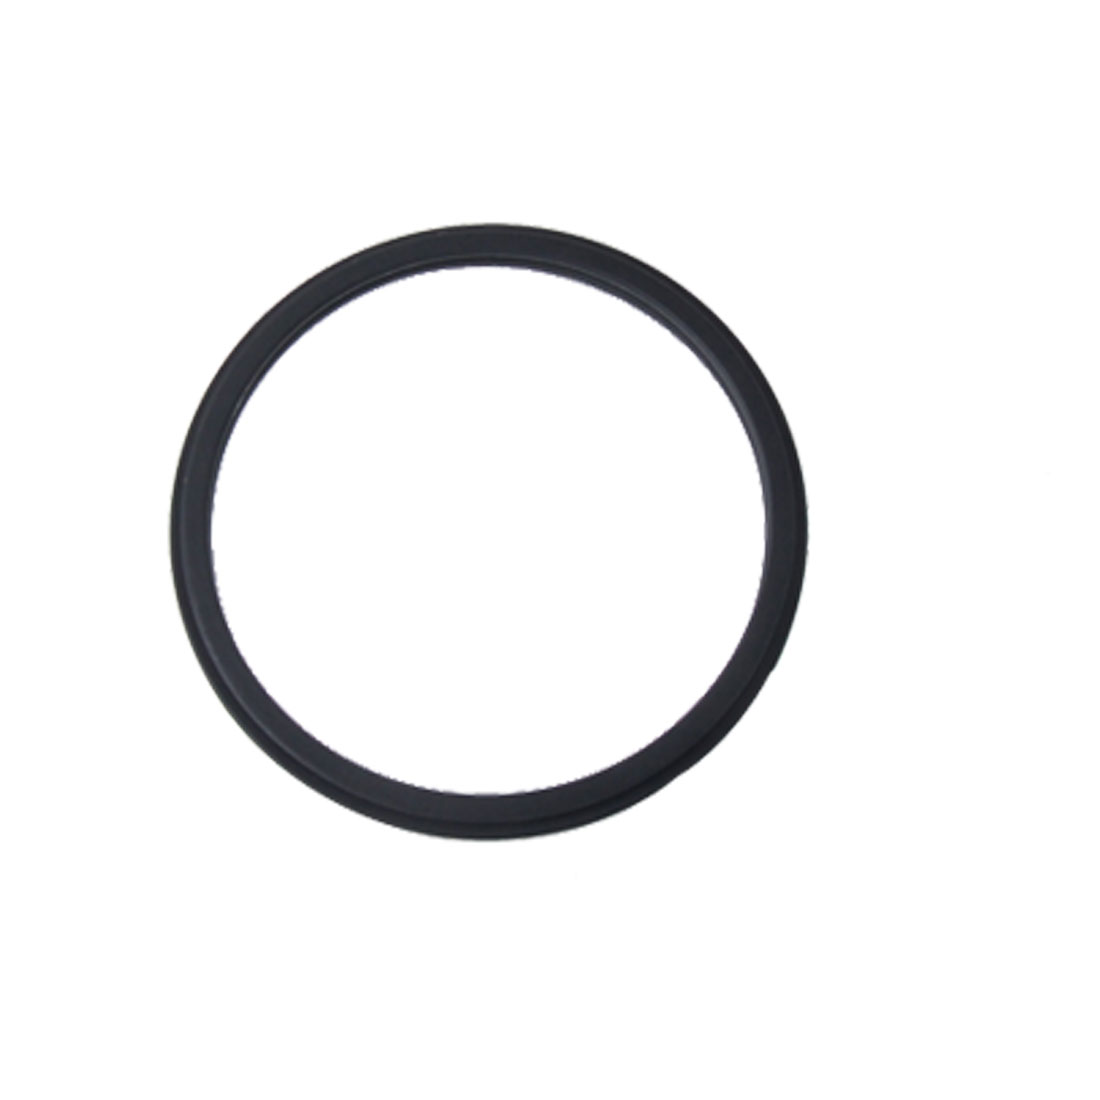 52mm UV Ultra-Violet Filter Lens Black Ring for Camera